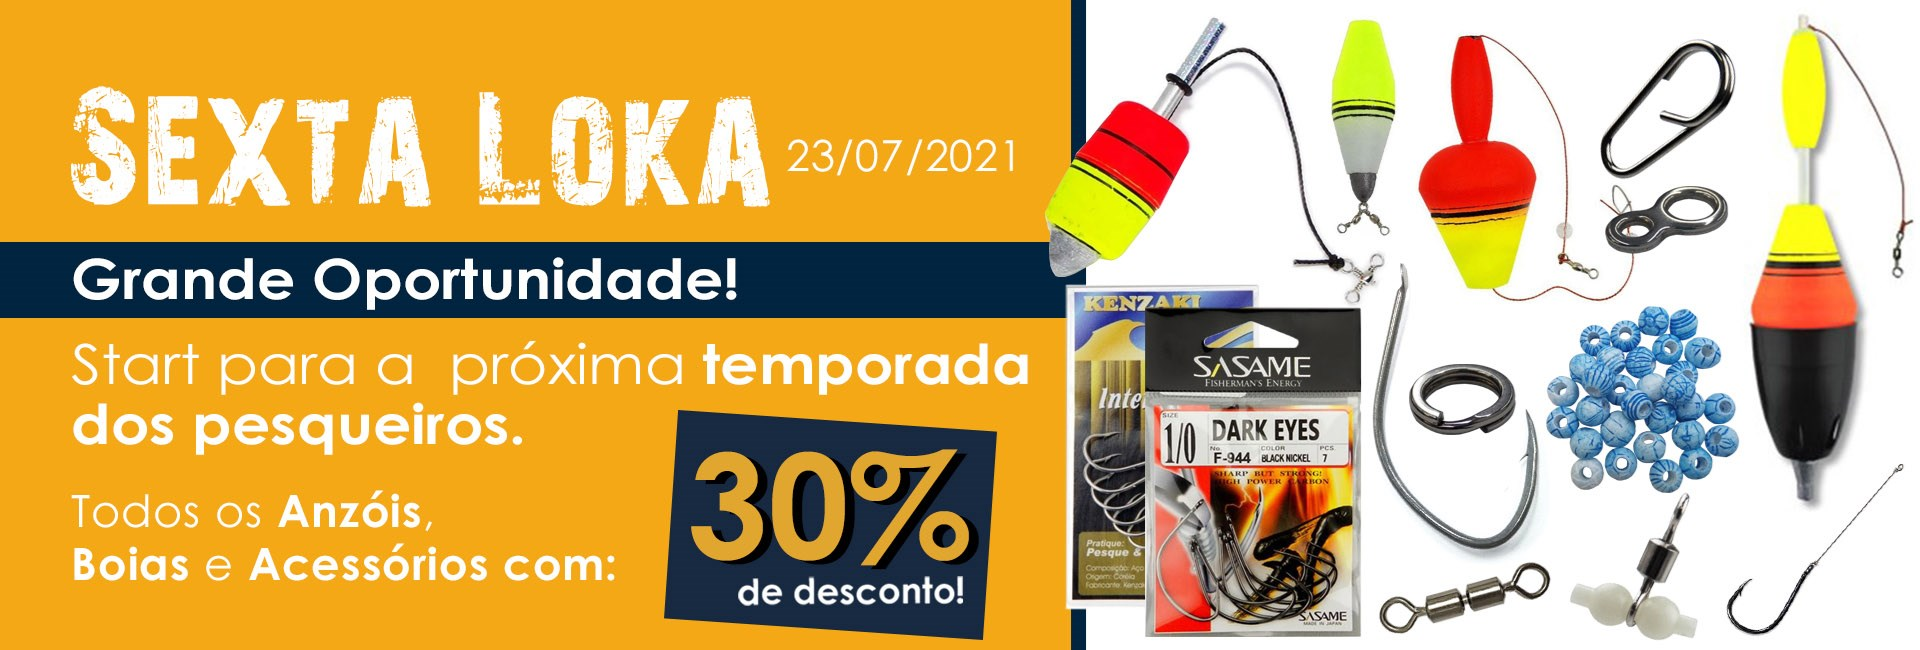 Sexta Loka - Temporada Pesqueiros 30%